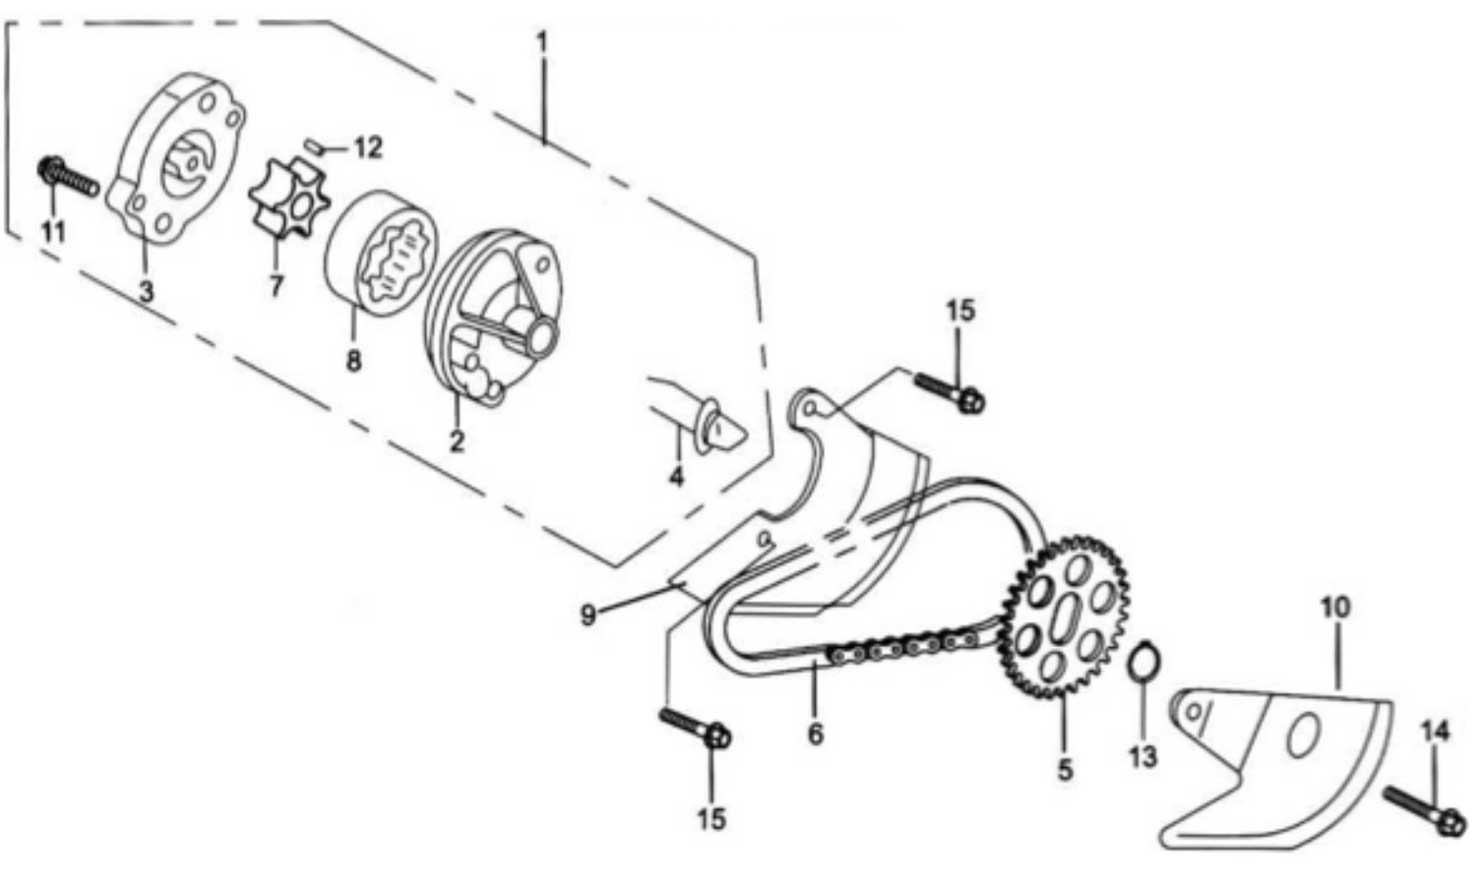 Baja Dune 150cc Wiring Diagram. Baja Scooter 48 Volt Wiring ... Baja Dune Cc Wiring Diagram on baja scooter 48 volt wiring schematic, baja motorsports reaction 150 wiring diagram, baja dune buggy,